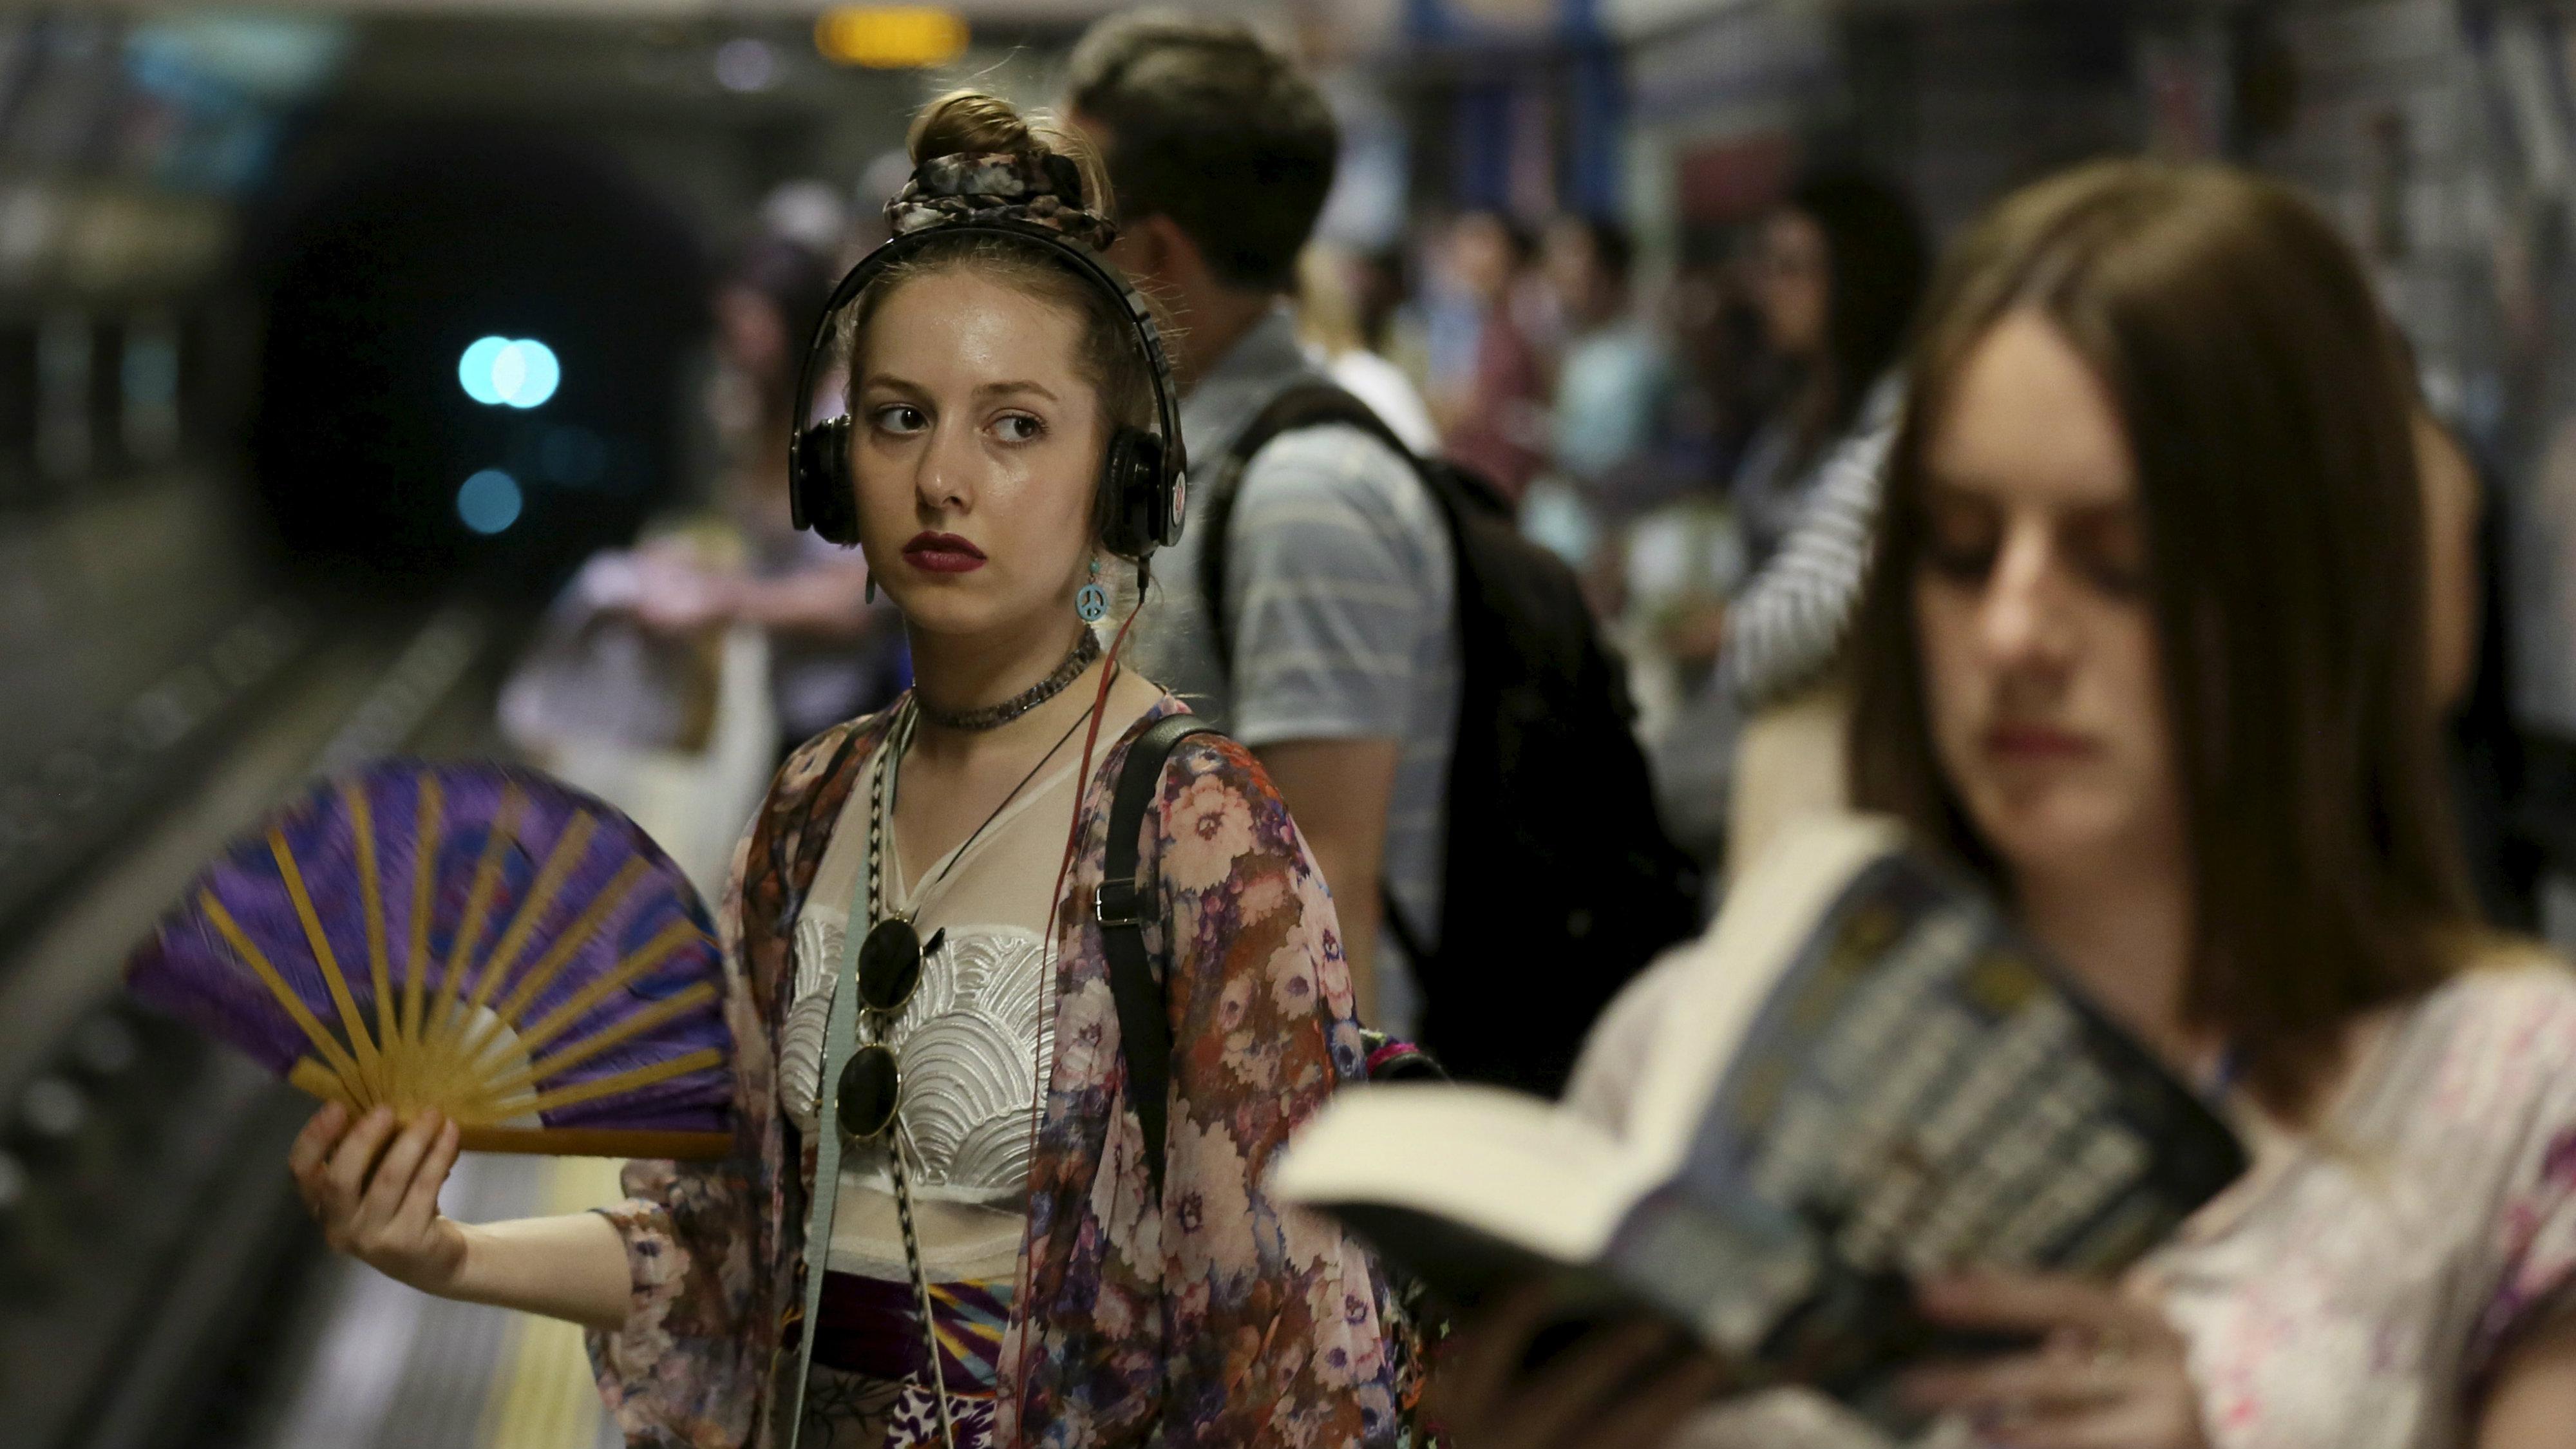 Millennial boarding a train